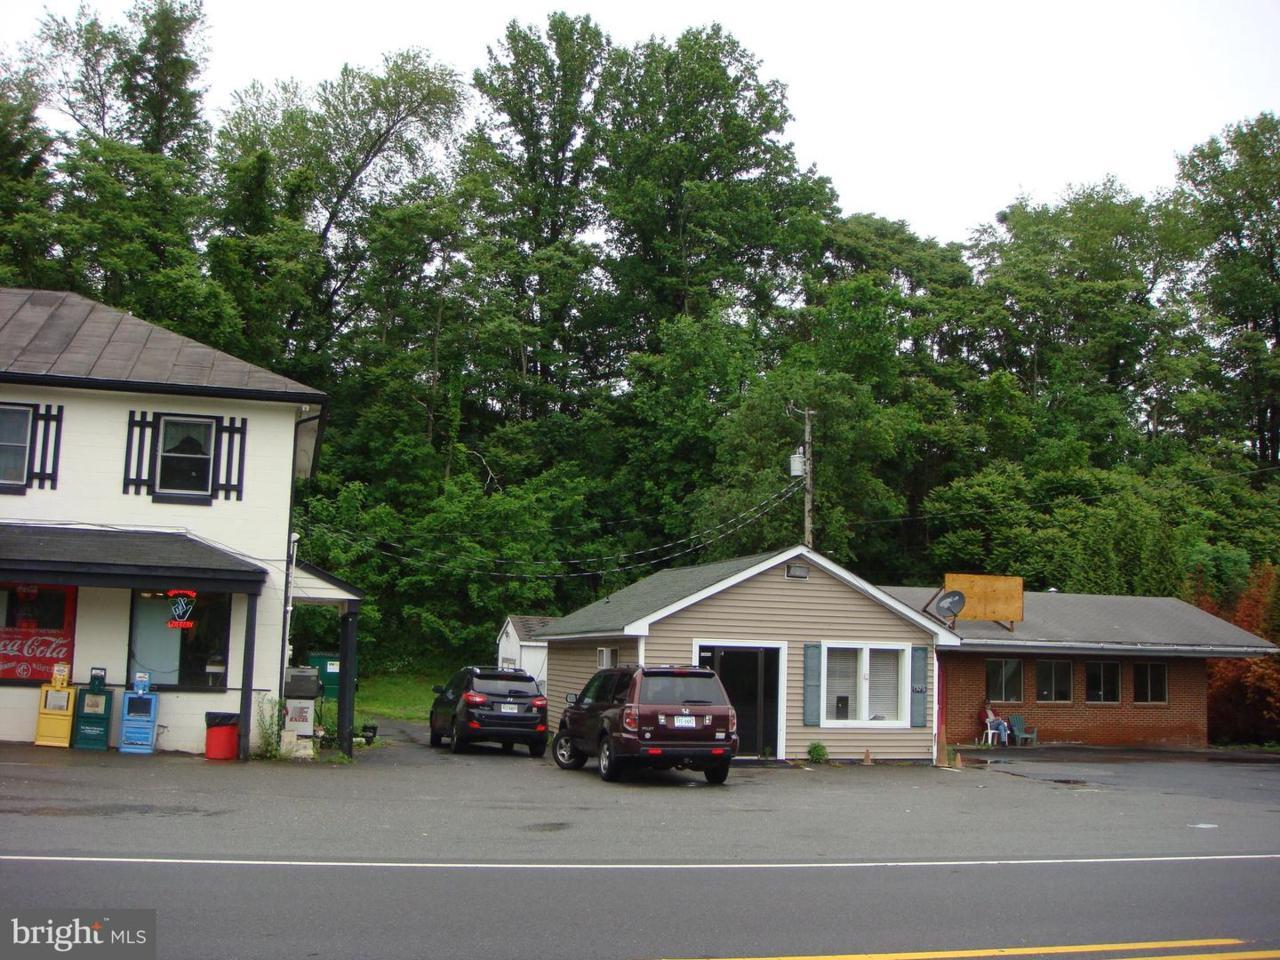 1779 Rockfish Valley Highway - Photo 1